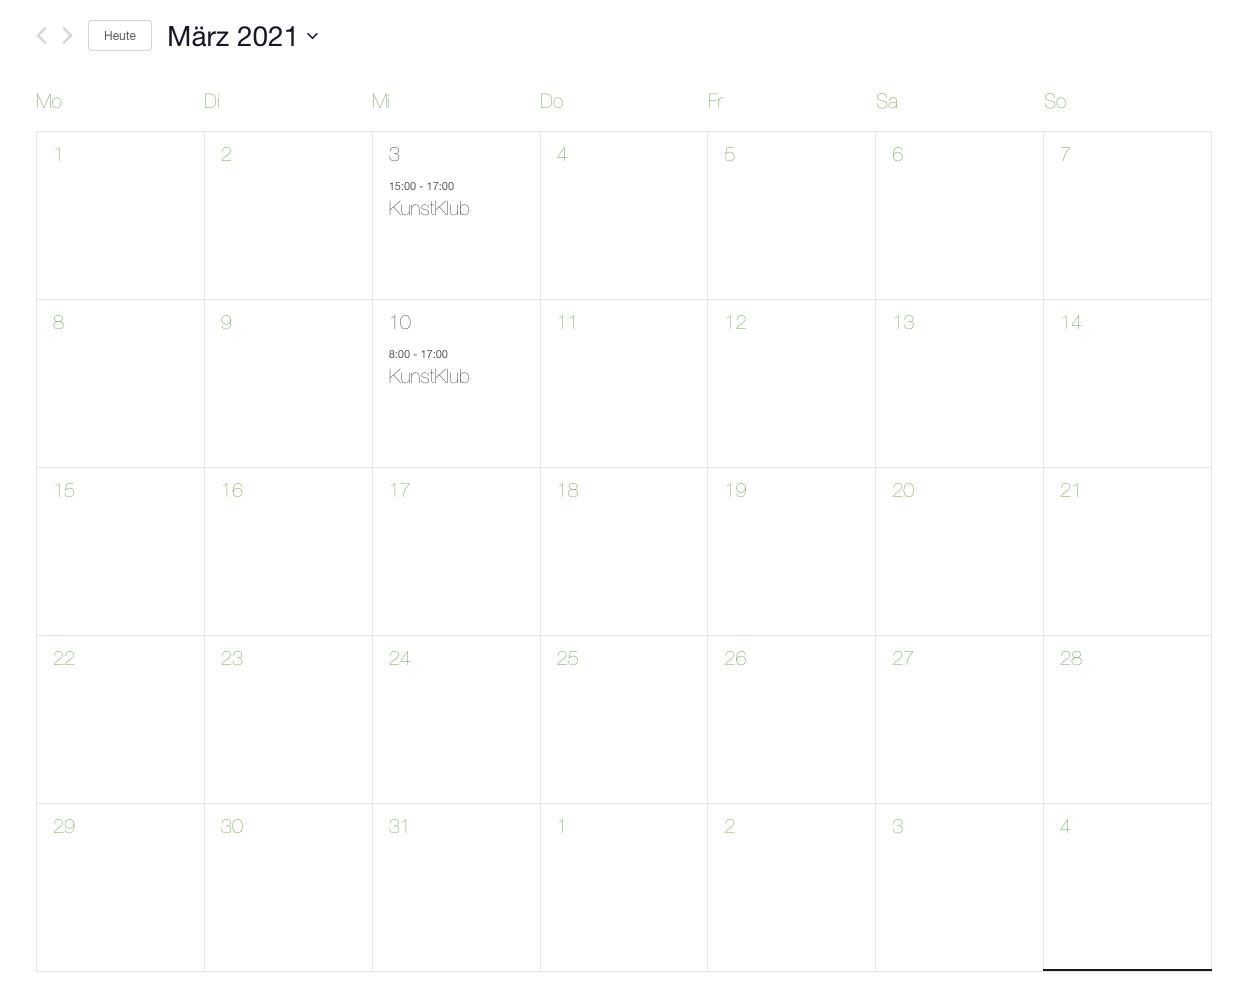 Programmkalender